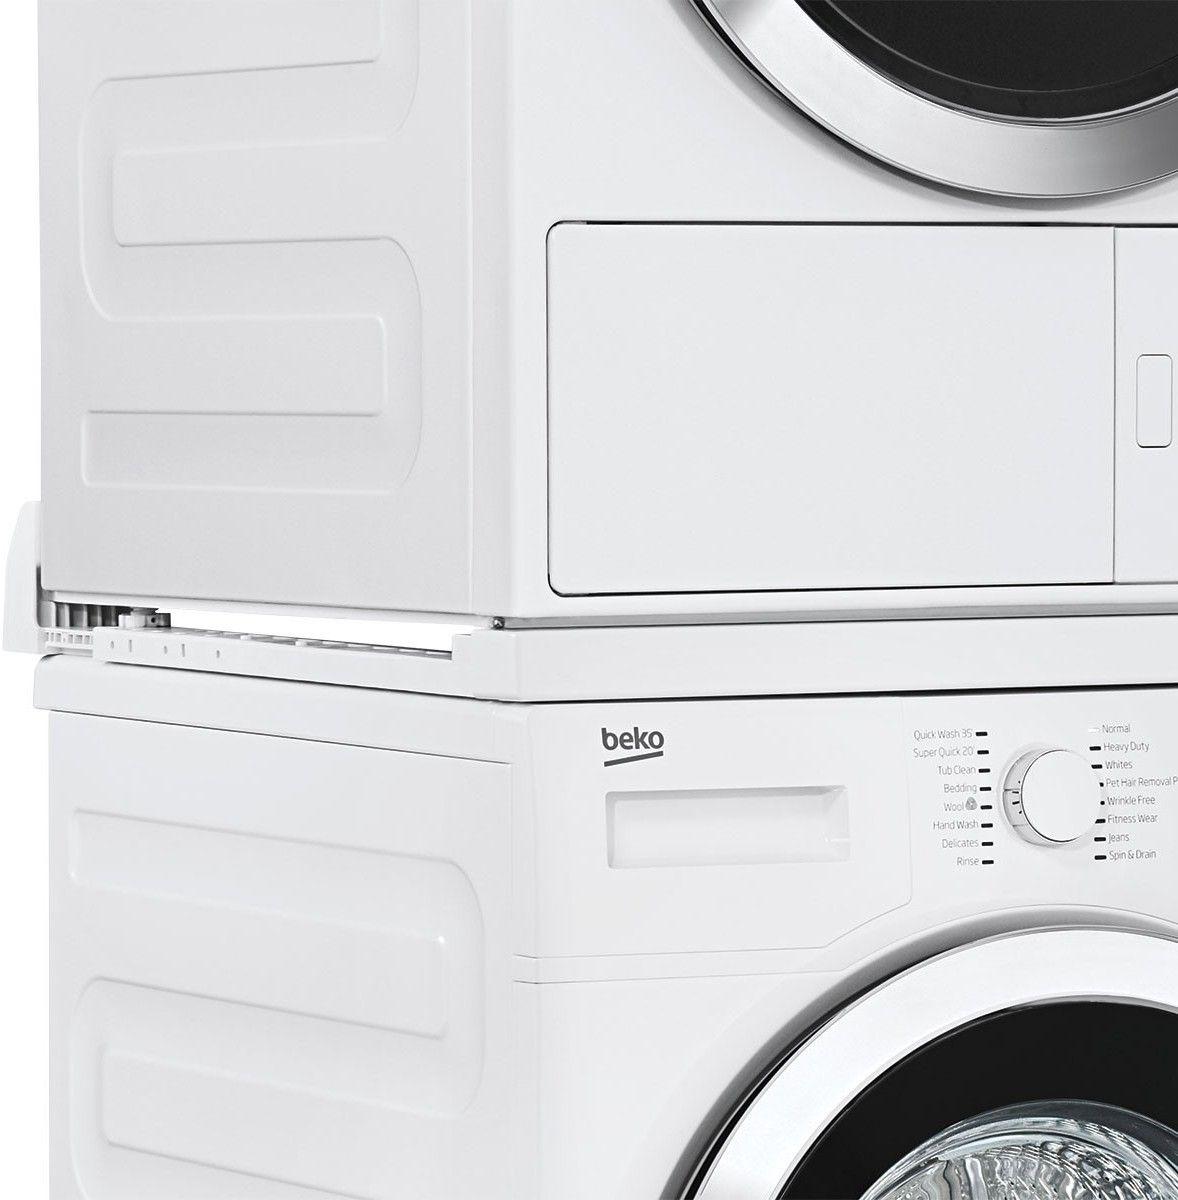 Beko 2992100300 In 2020 Laundry Washing Machine Home Appliances